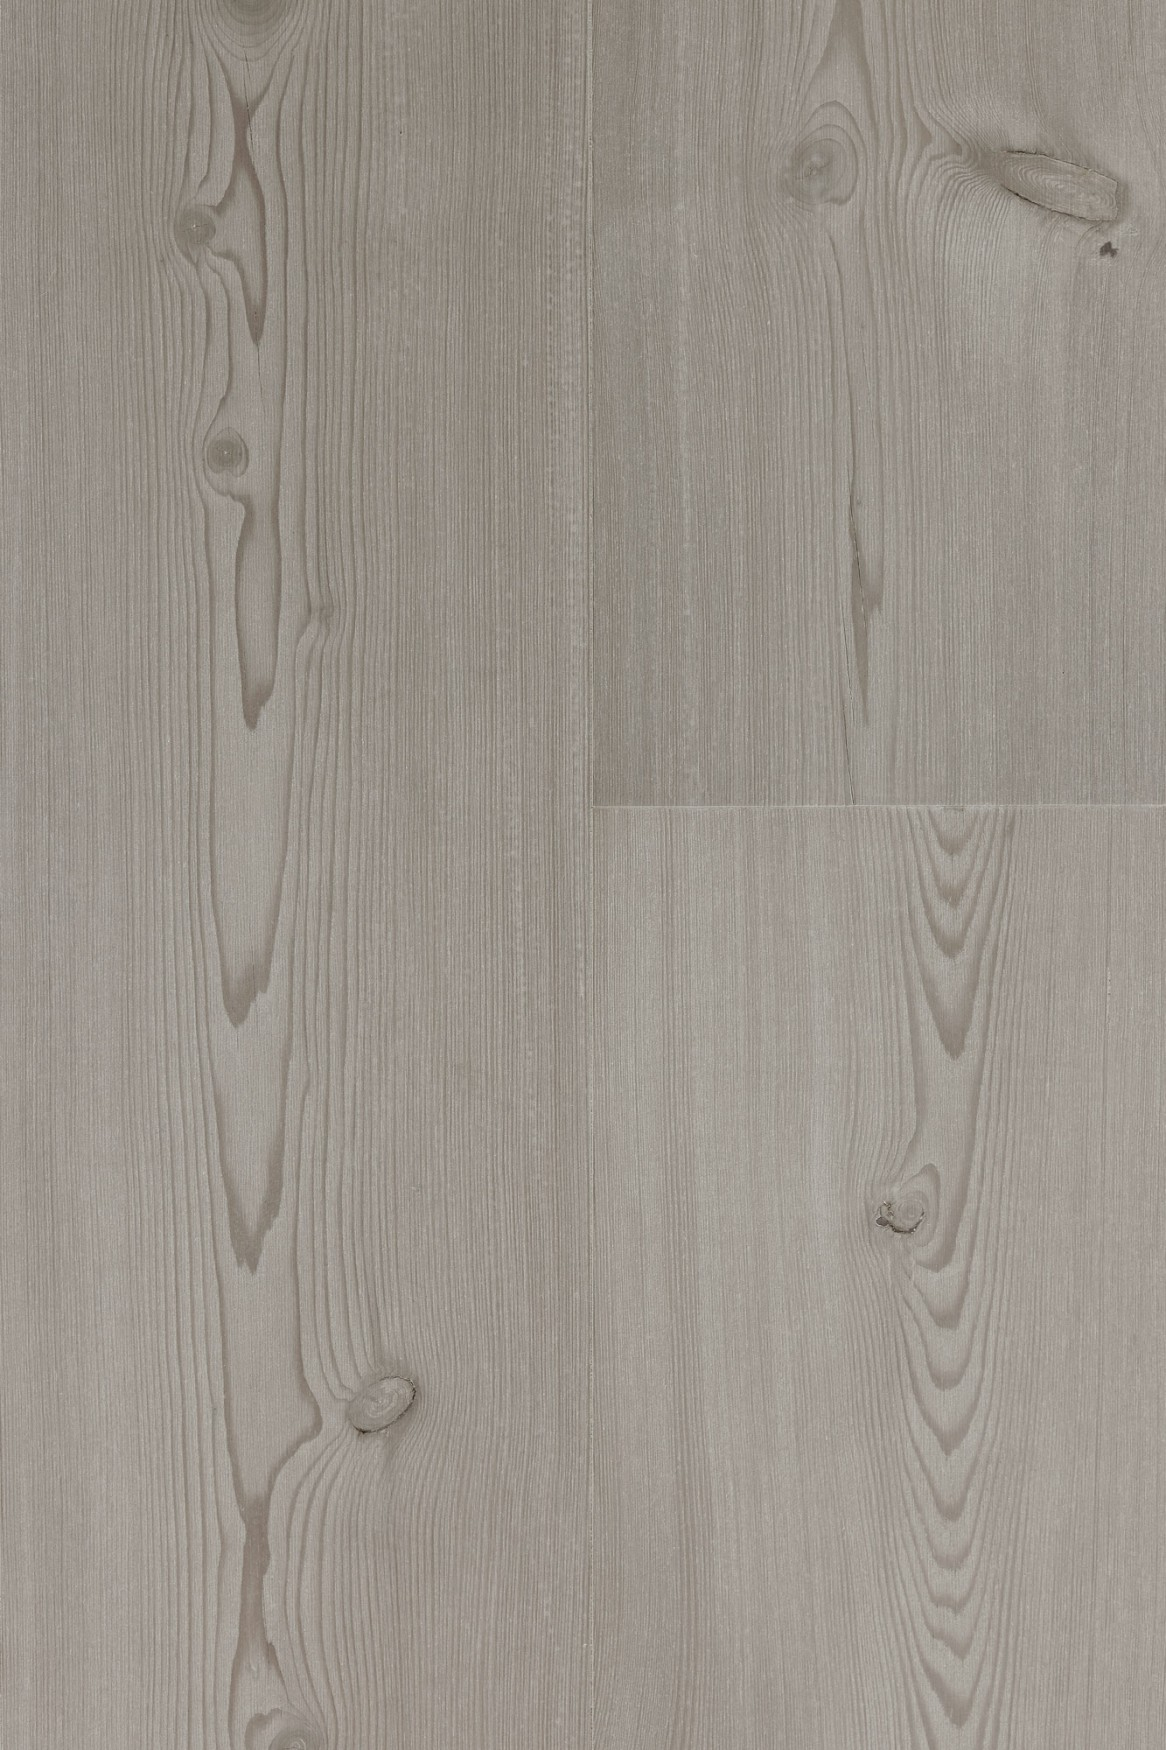 Element7_Wide-plank_562_538_GreyLarch